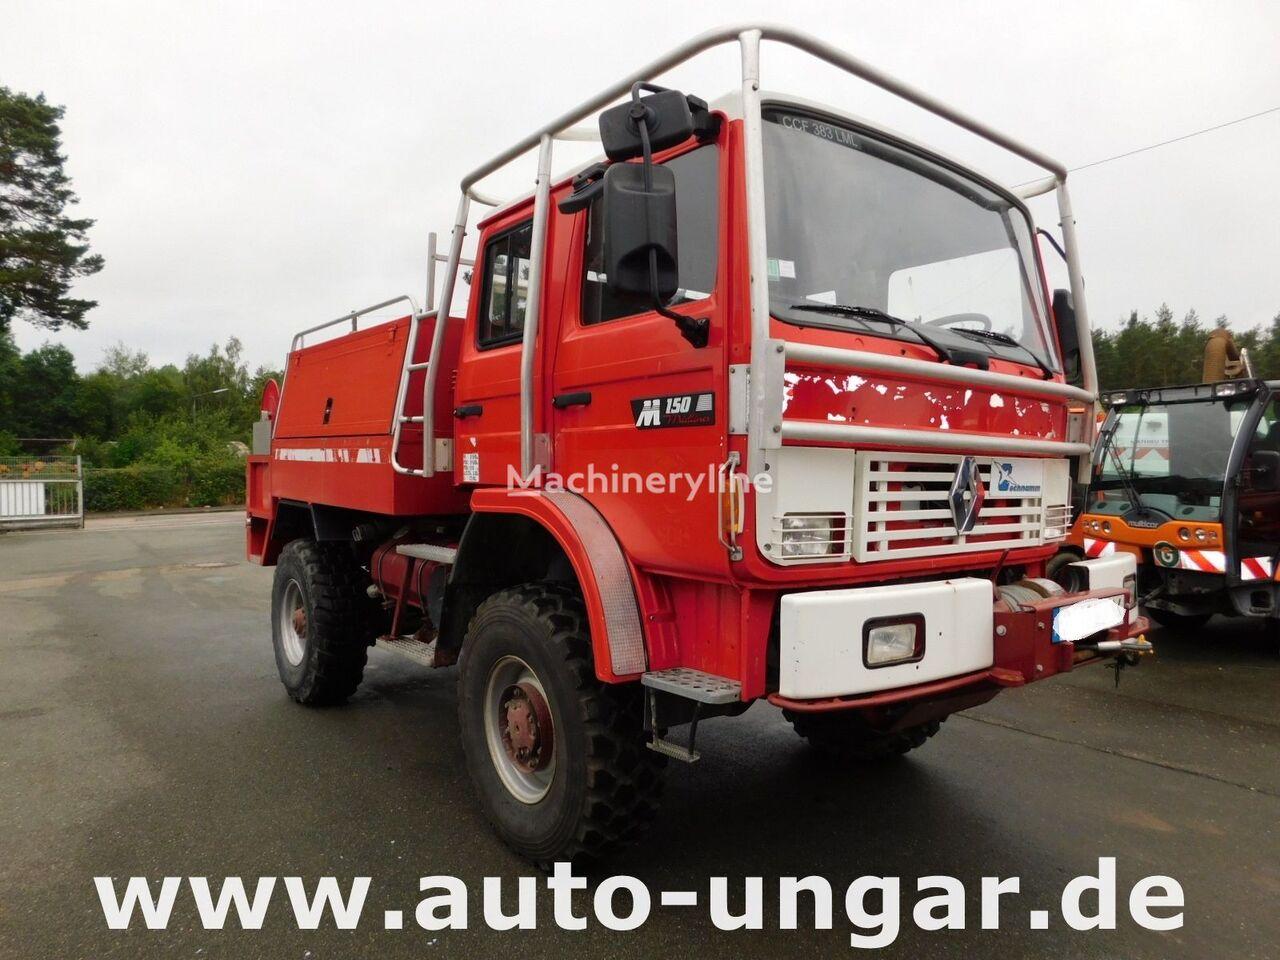 RENAULT M150 Midliner 4x4 Feuerwehr TLF 2000 Off-Road Waldbrand carro de bombeiros